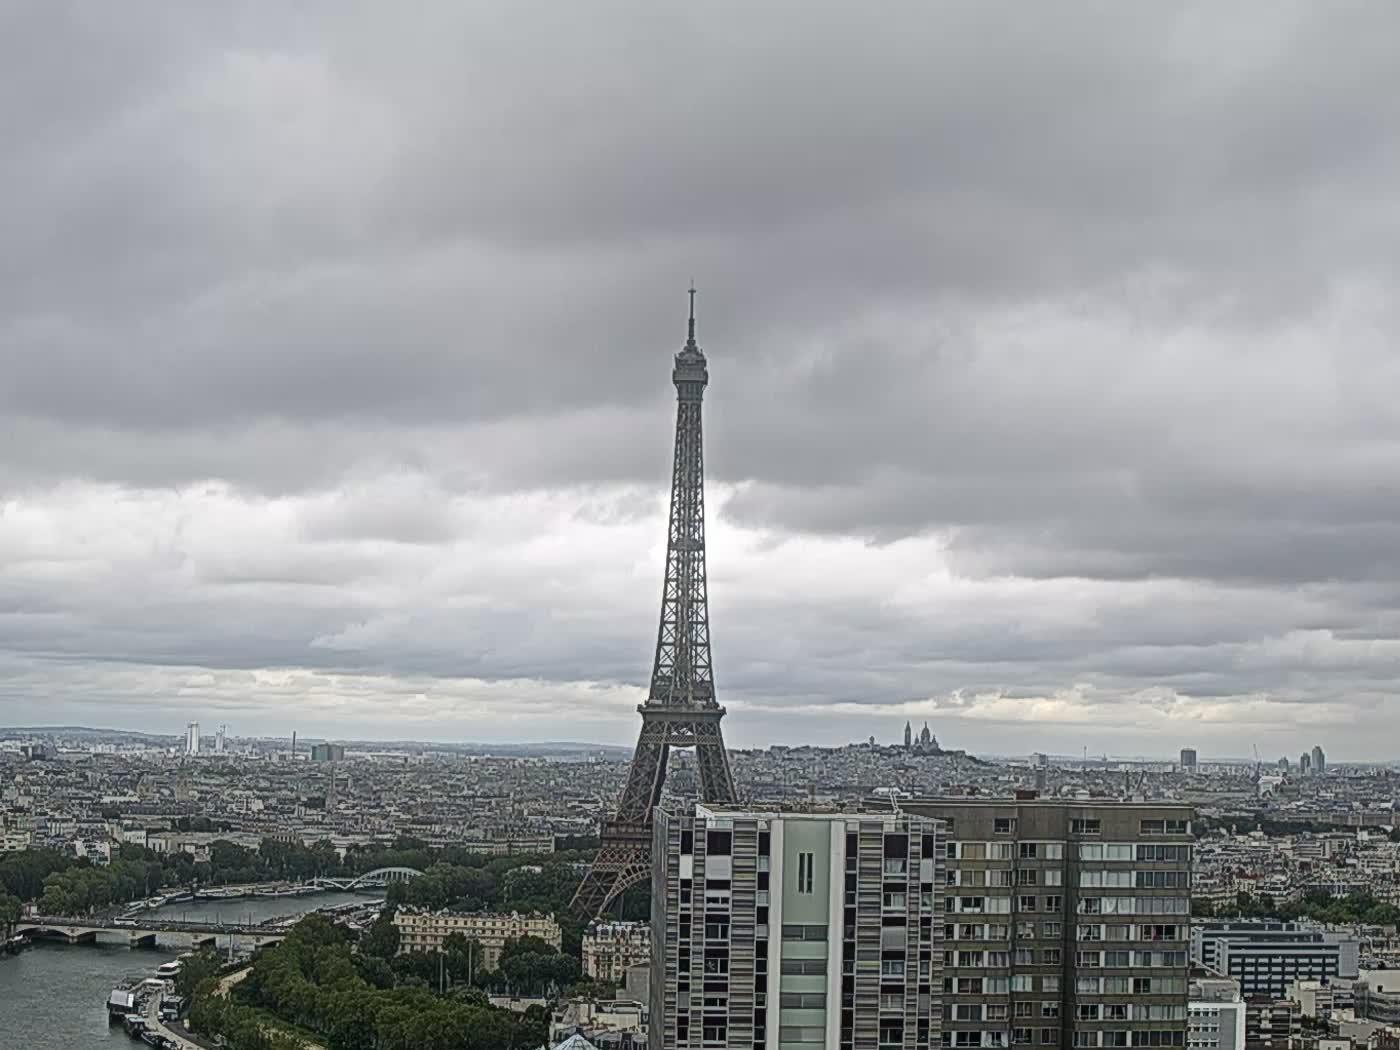 Paris Thu. 13:22